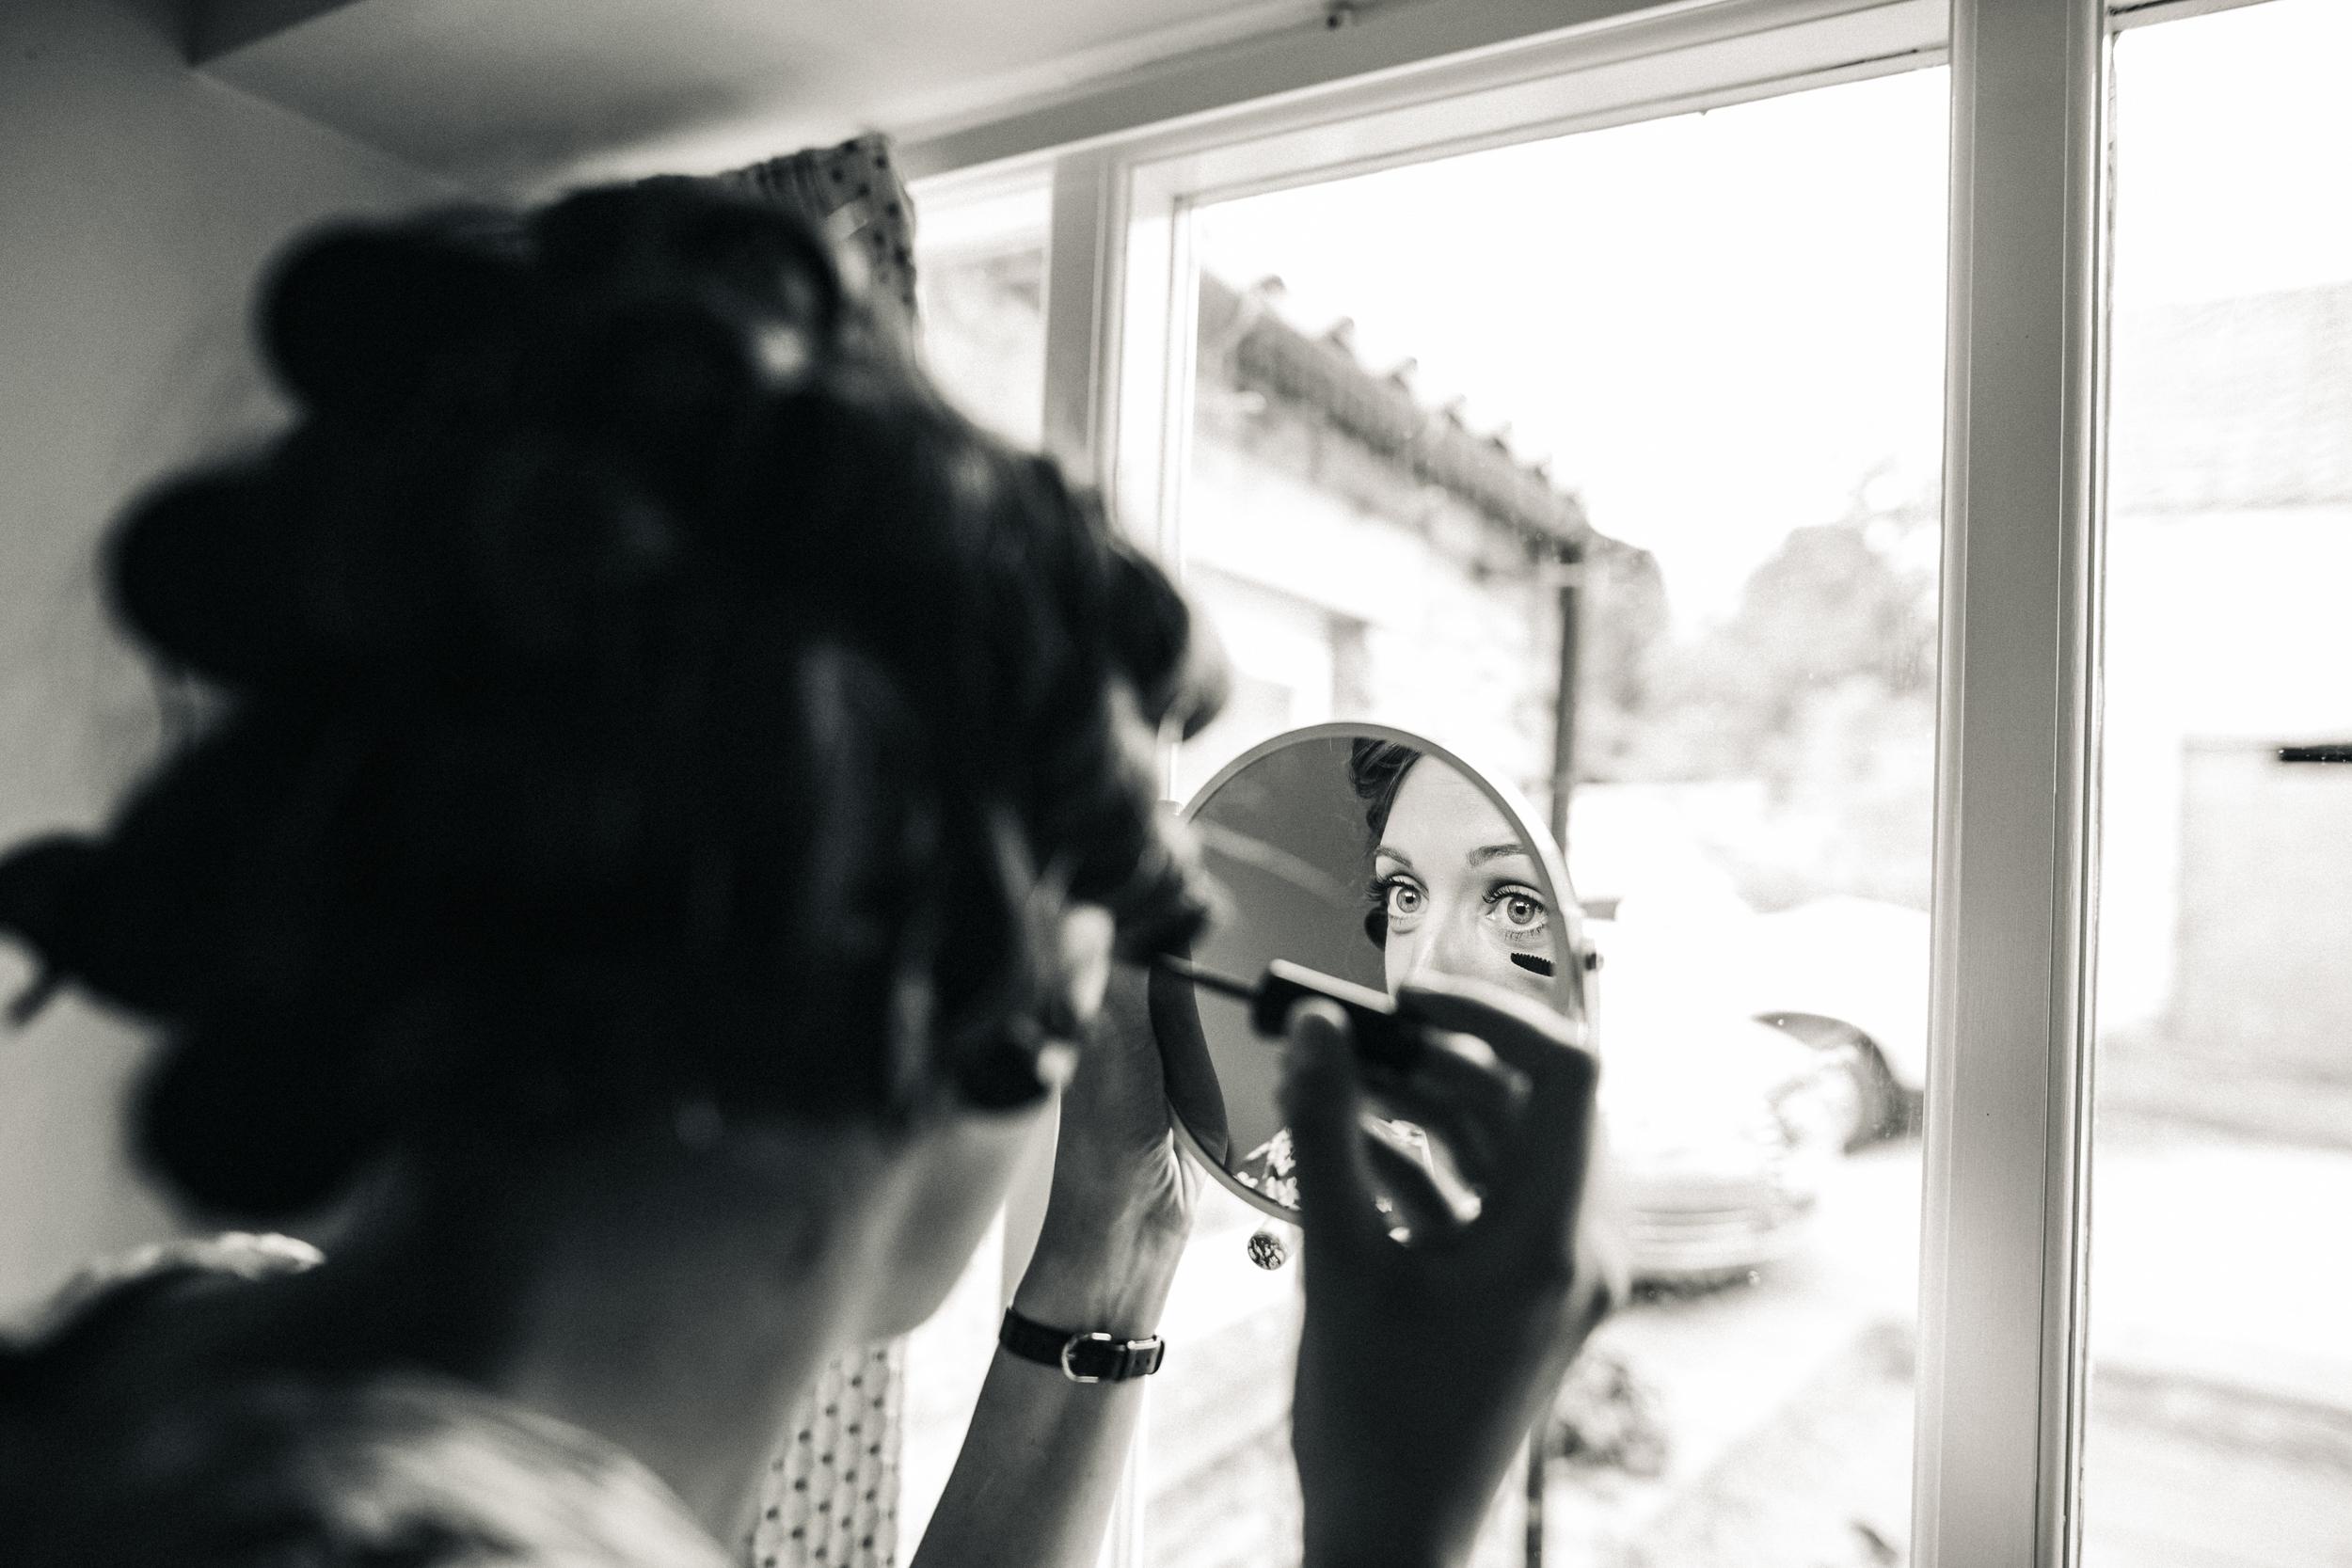 creative-wedding-photography-teesside-north-east-yorkshire-79.jpg